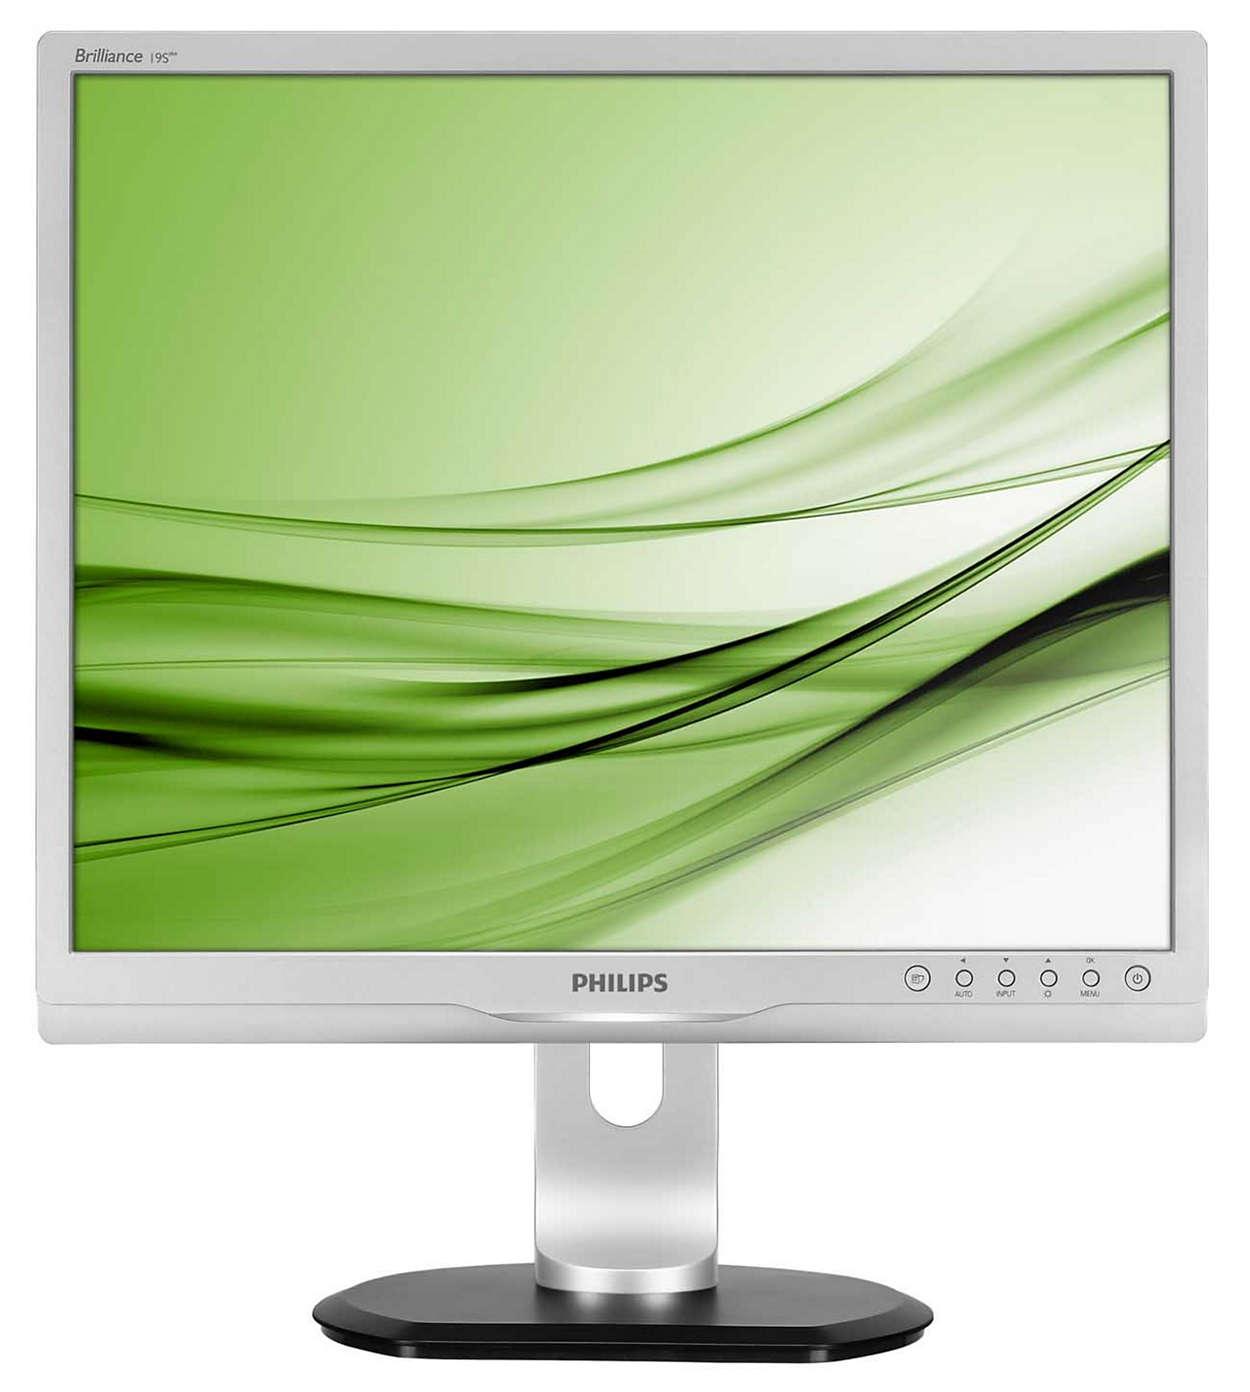 Ergonomic display enhances productivity